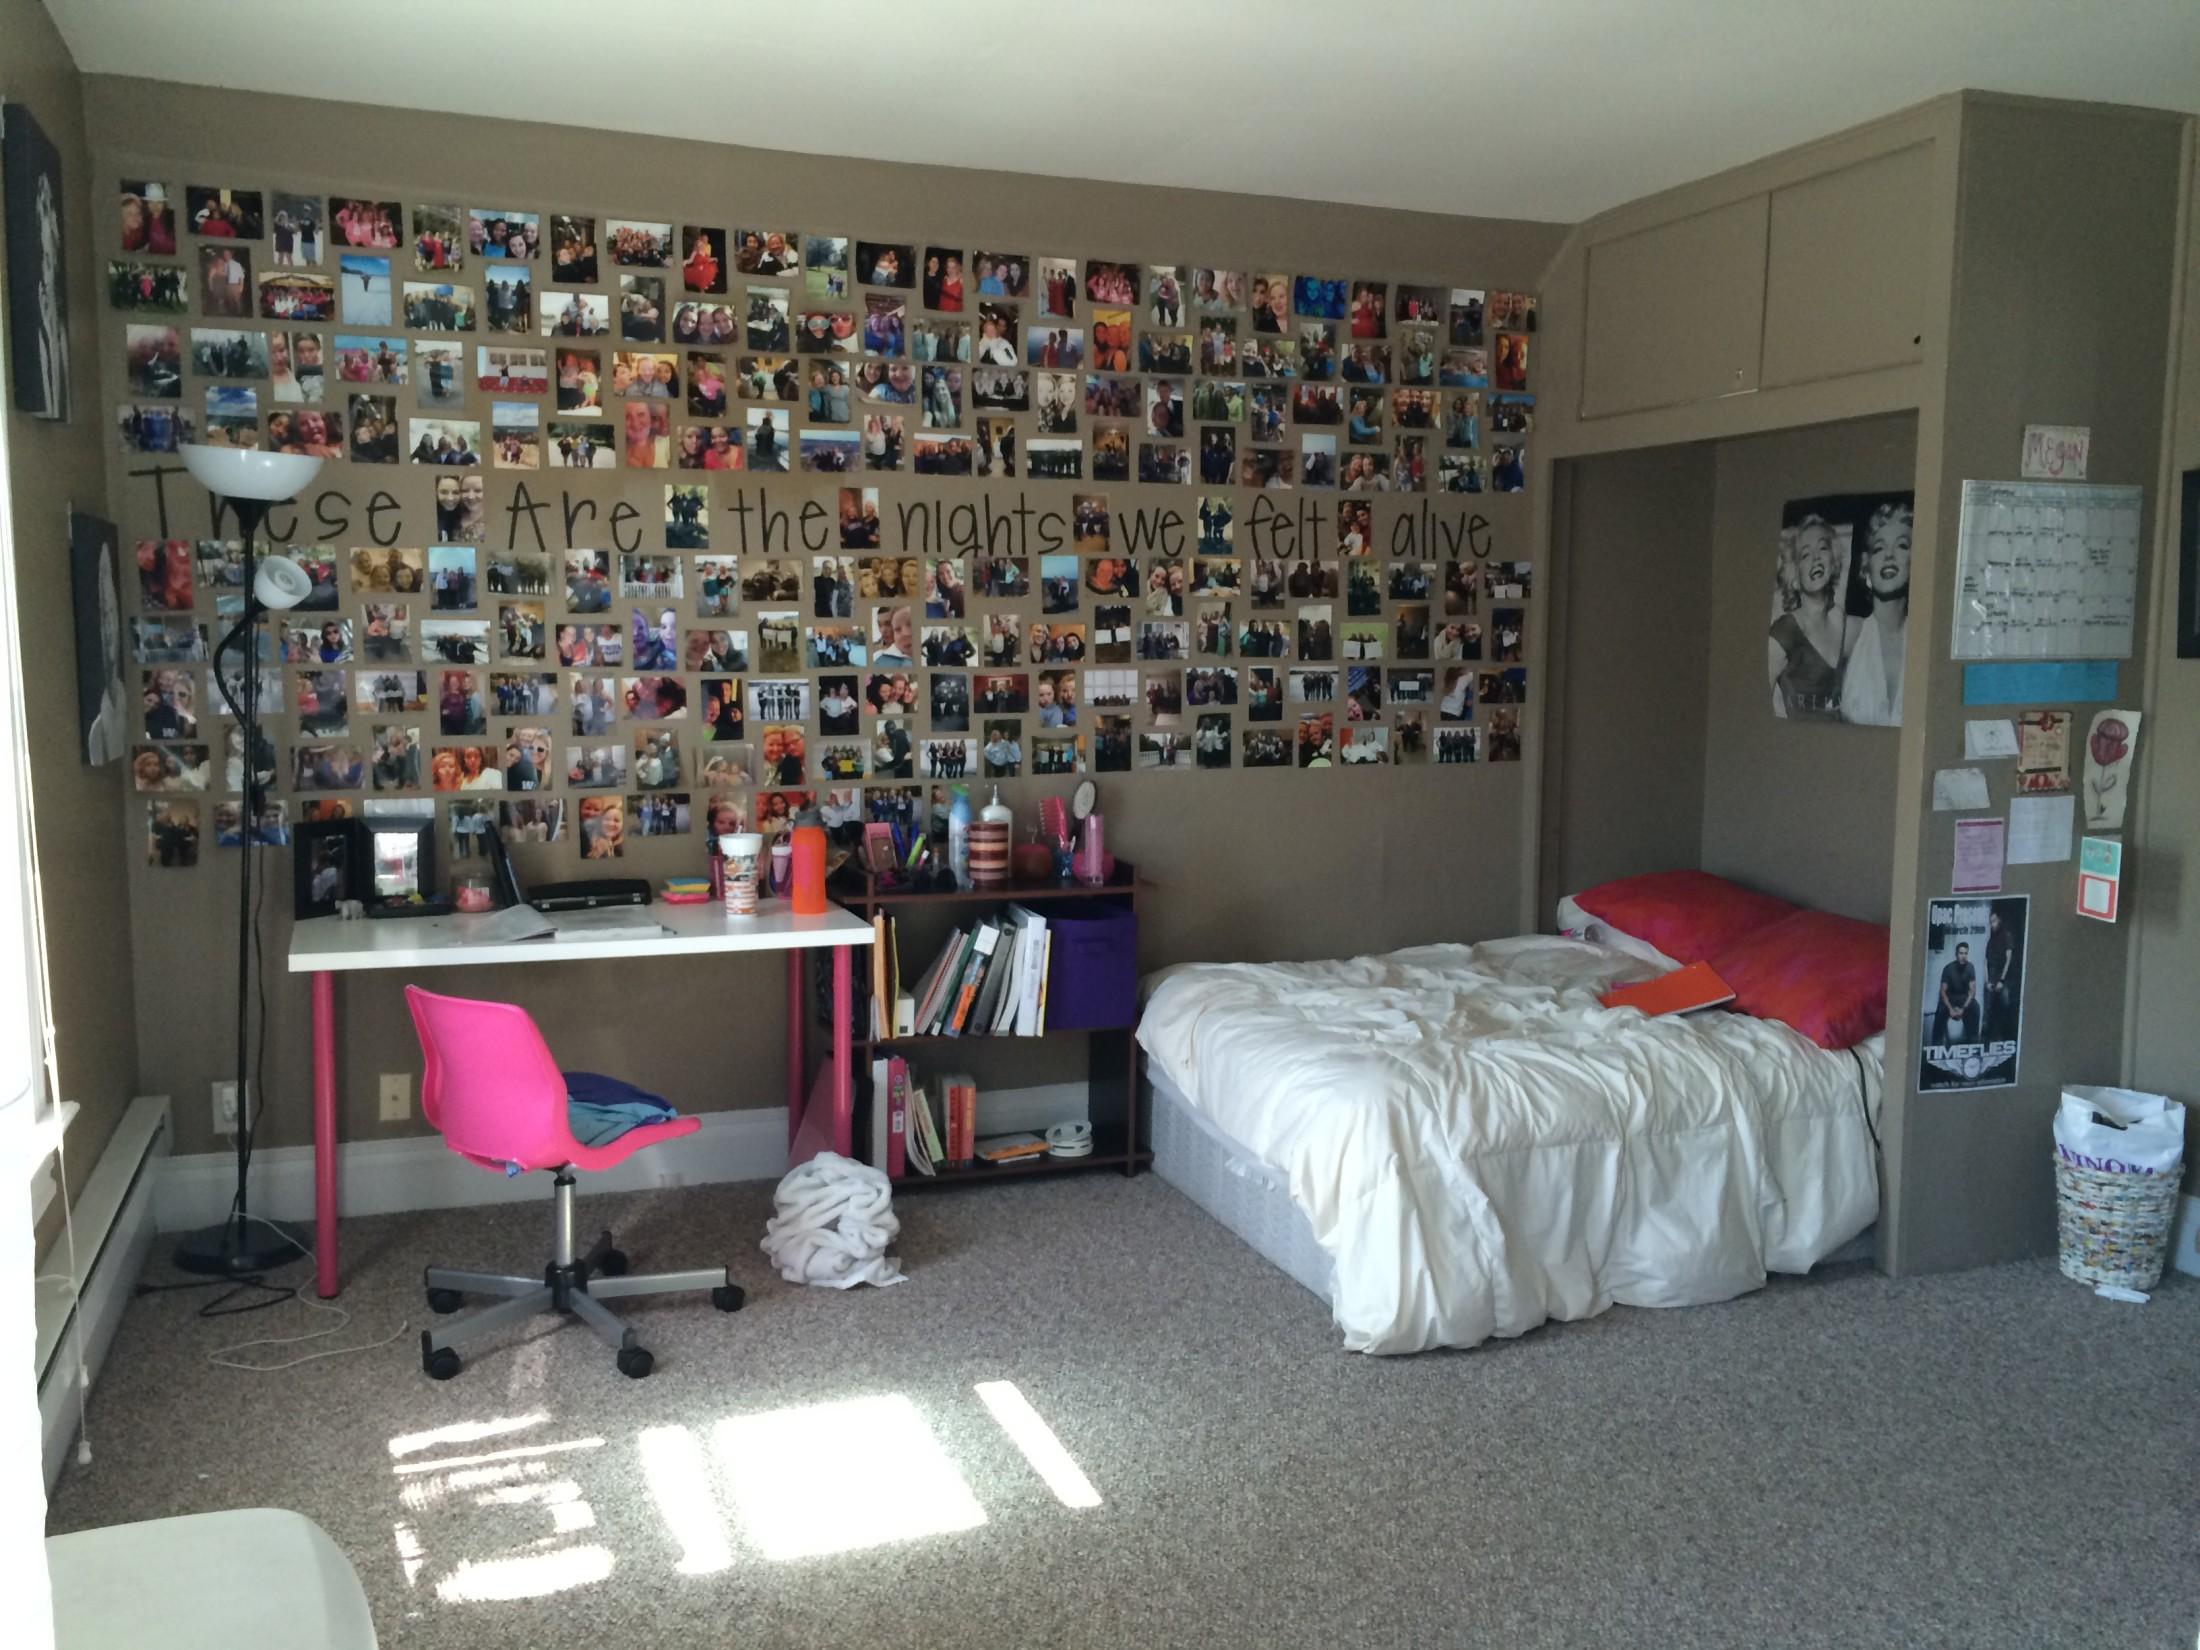 winona state university 3 bedroom apartment 6 blocks from campus